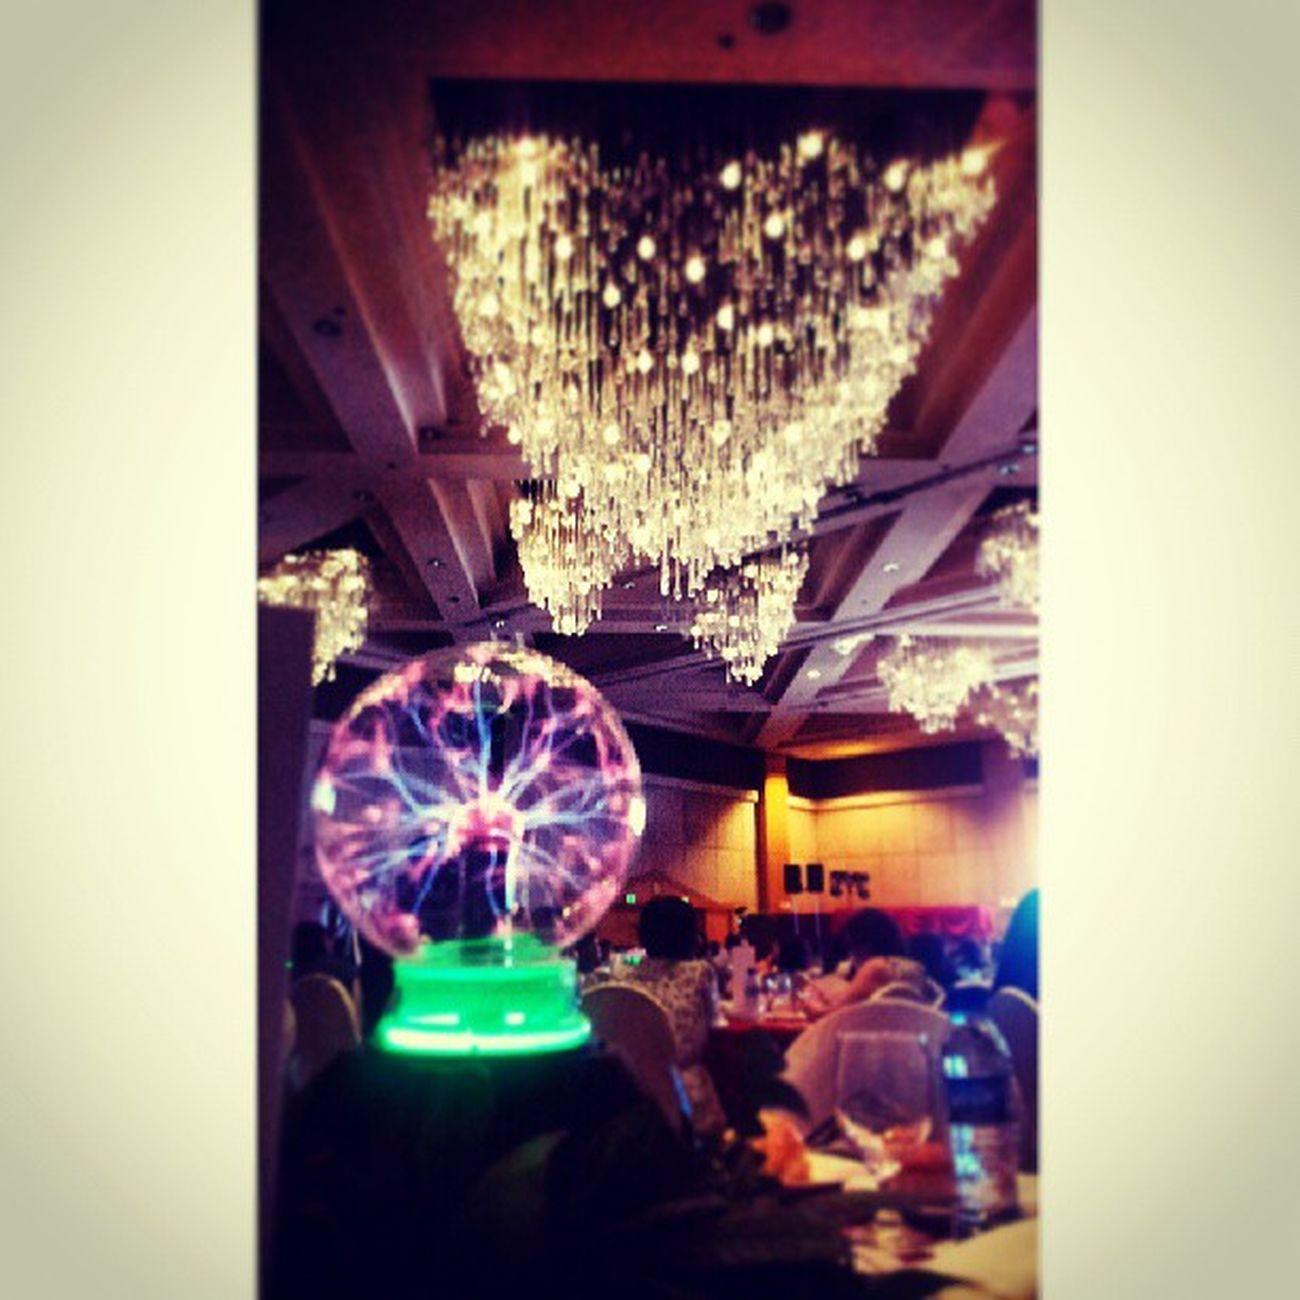 Plasma Ball Sofitelmanila Sofitel Luxuryhotel Samsungphotography phonephotography s2photography